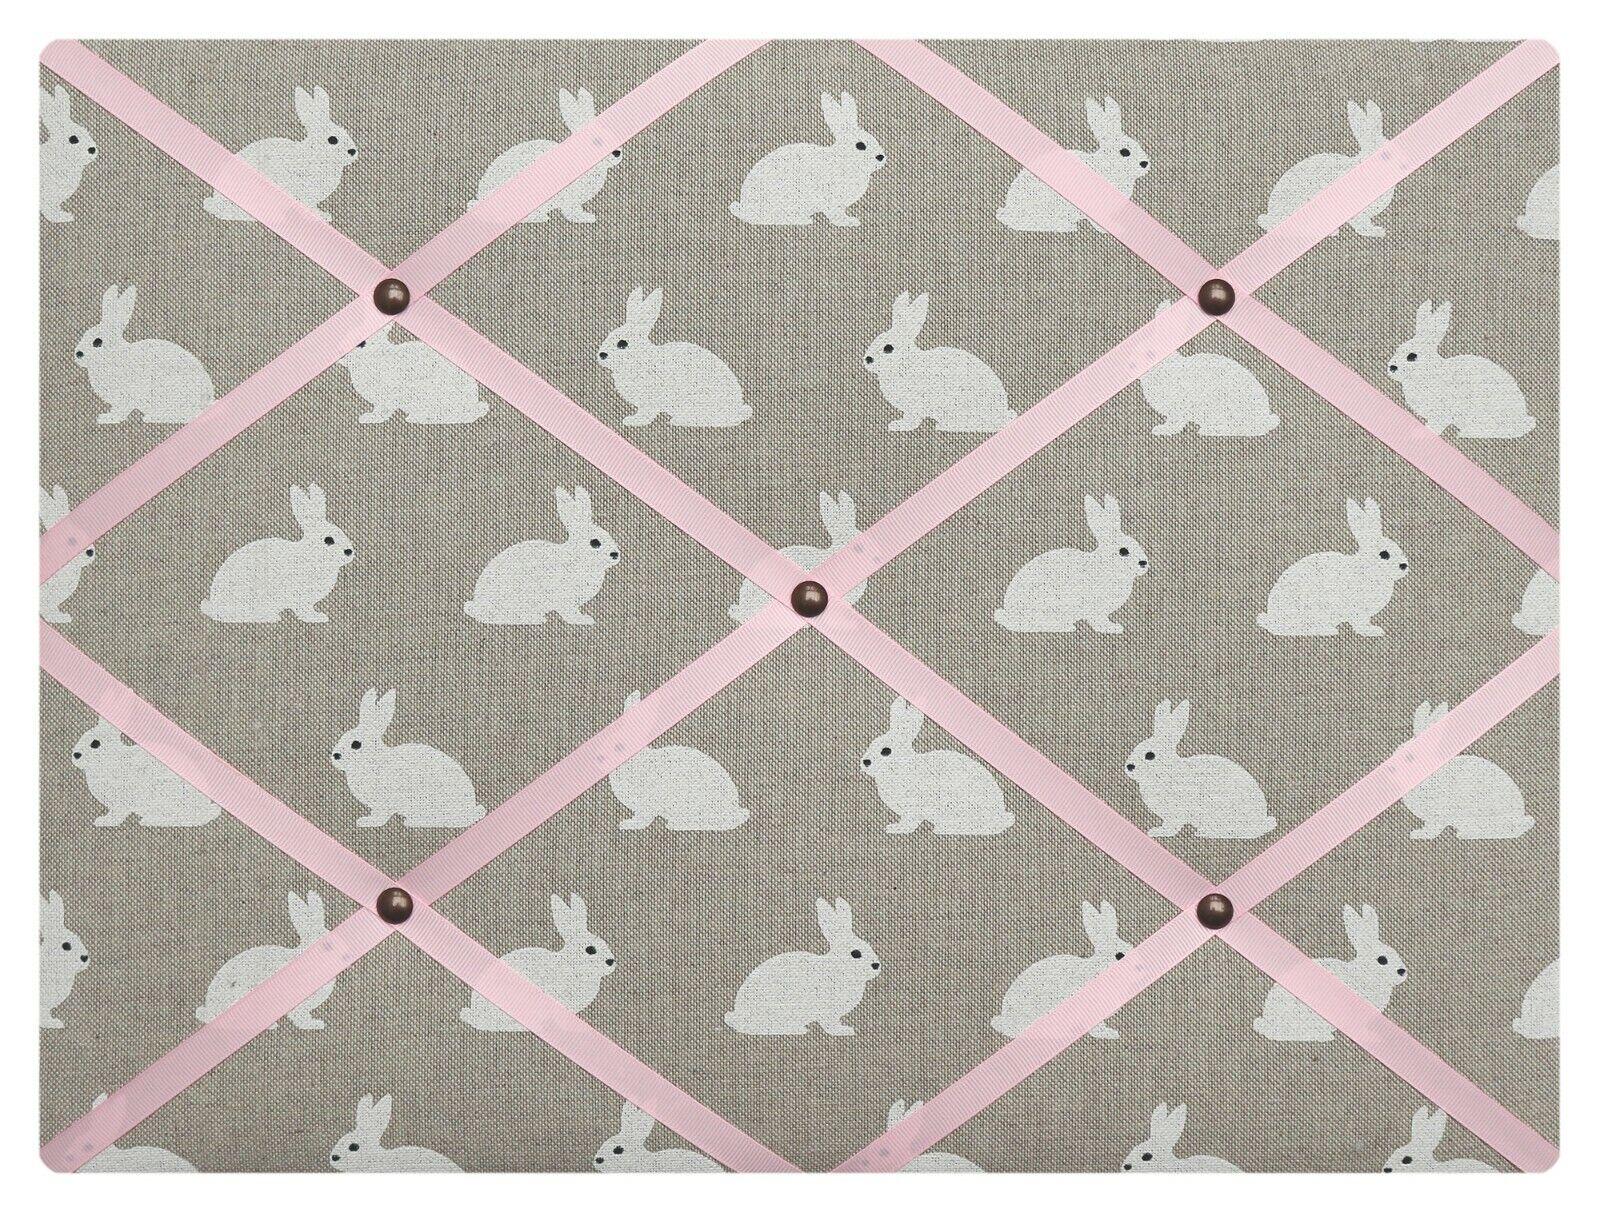 Bunny fabric notice board, pin board, many colourot ribbons, 60X50cm